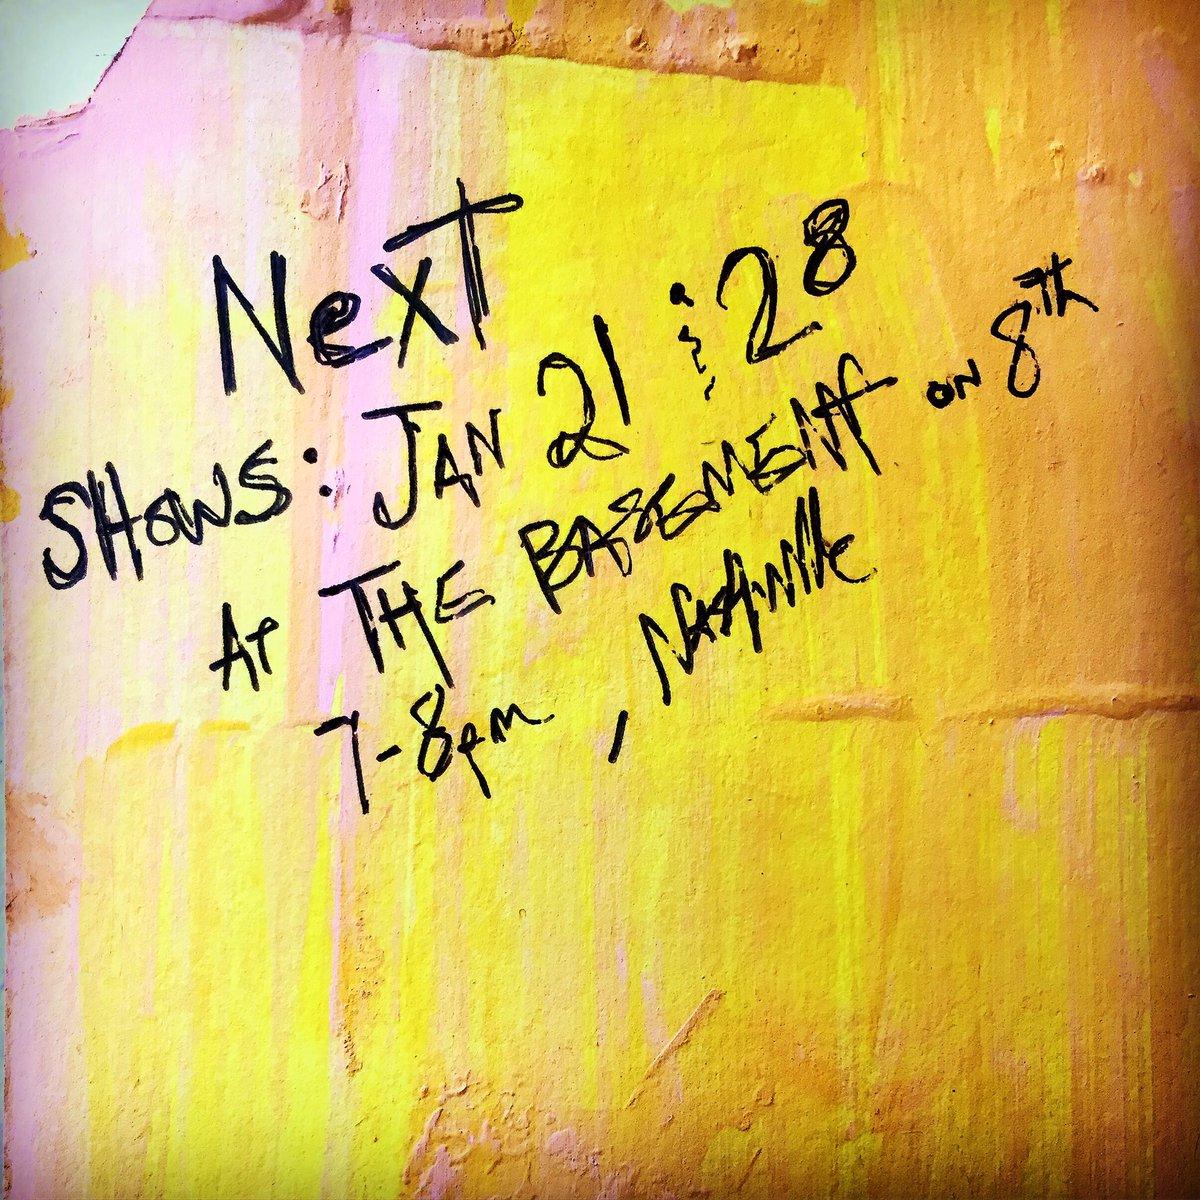 Next Shows: Jan 21 and Jan 28 at @TheBasementNash 7-8pm https://t.co/yaB1AbWVyn